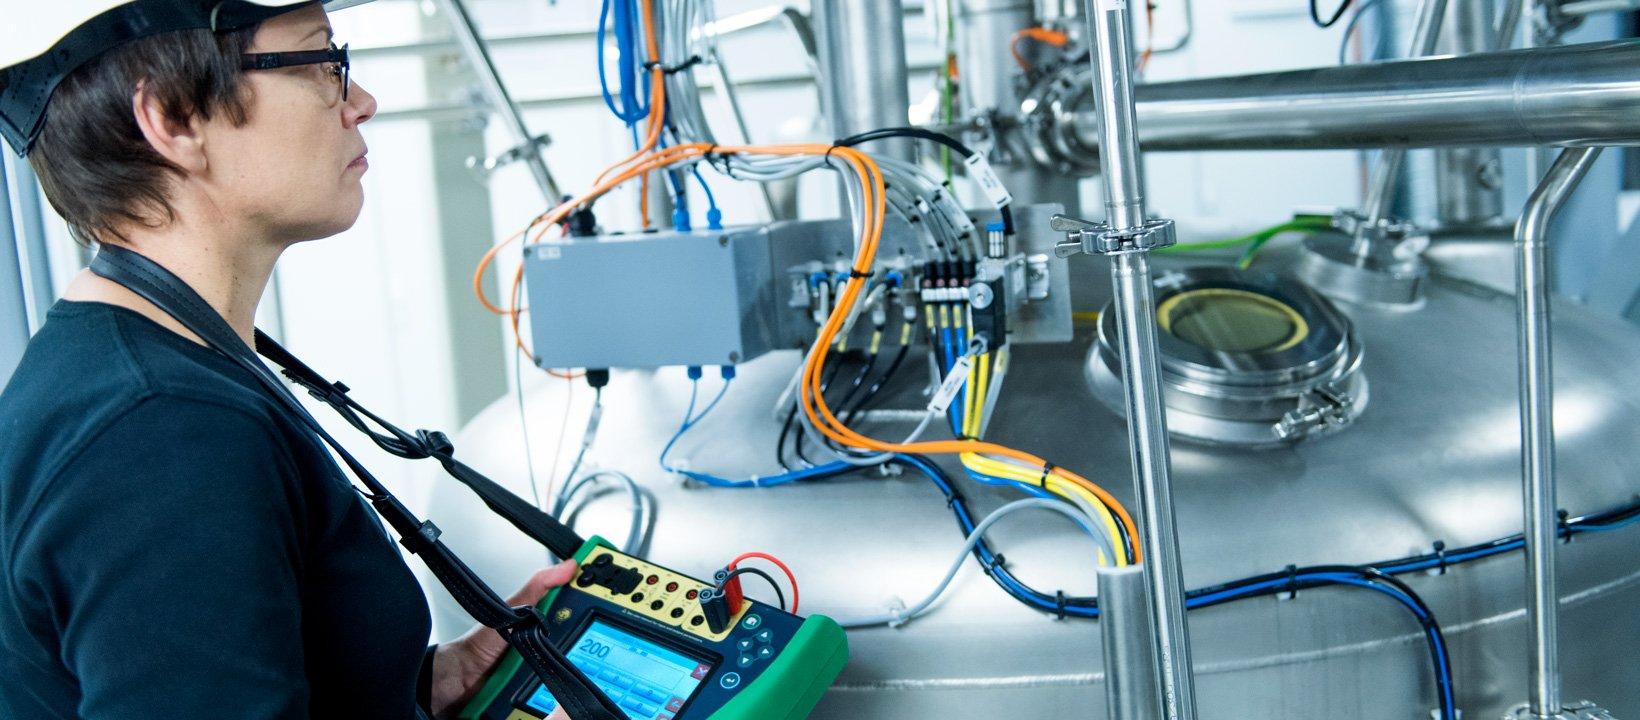 Optimal Calibration Parameters for Process Instrumentation